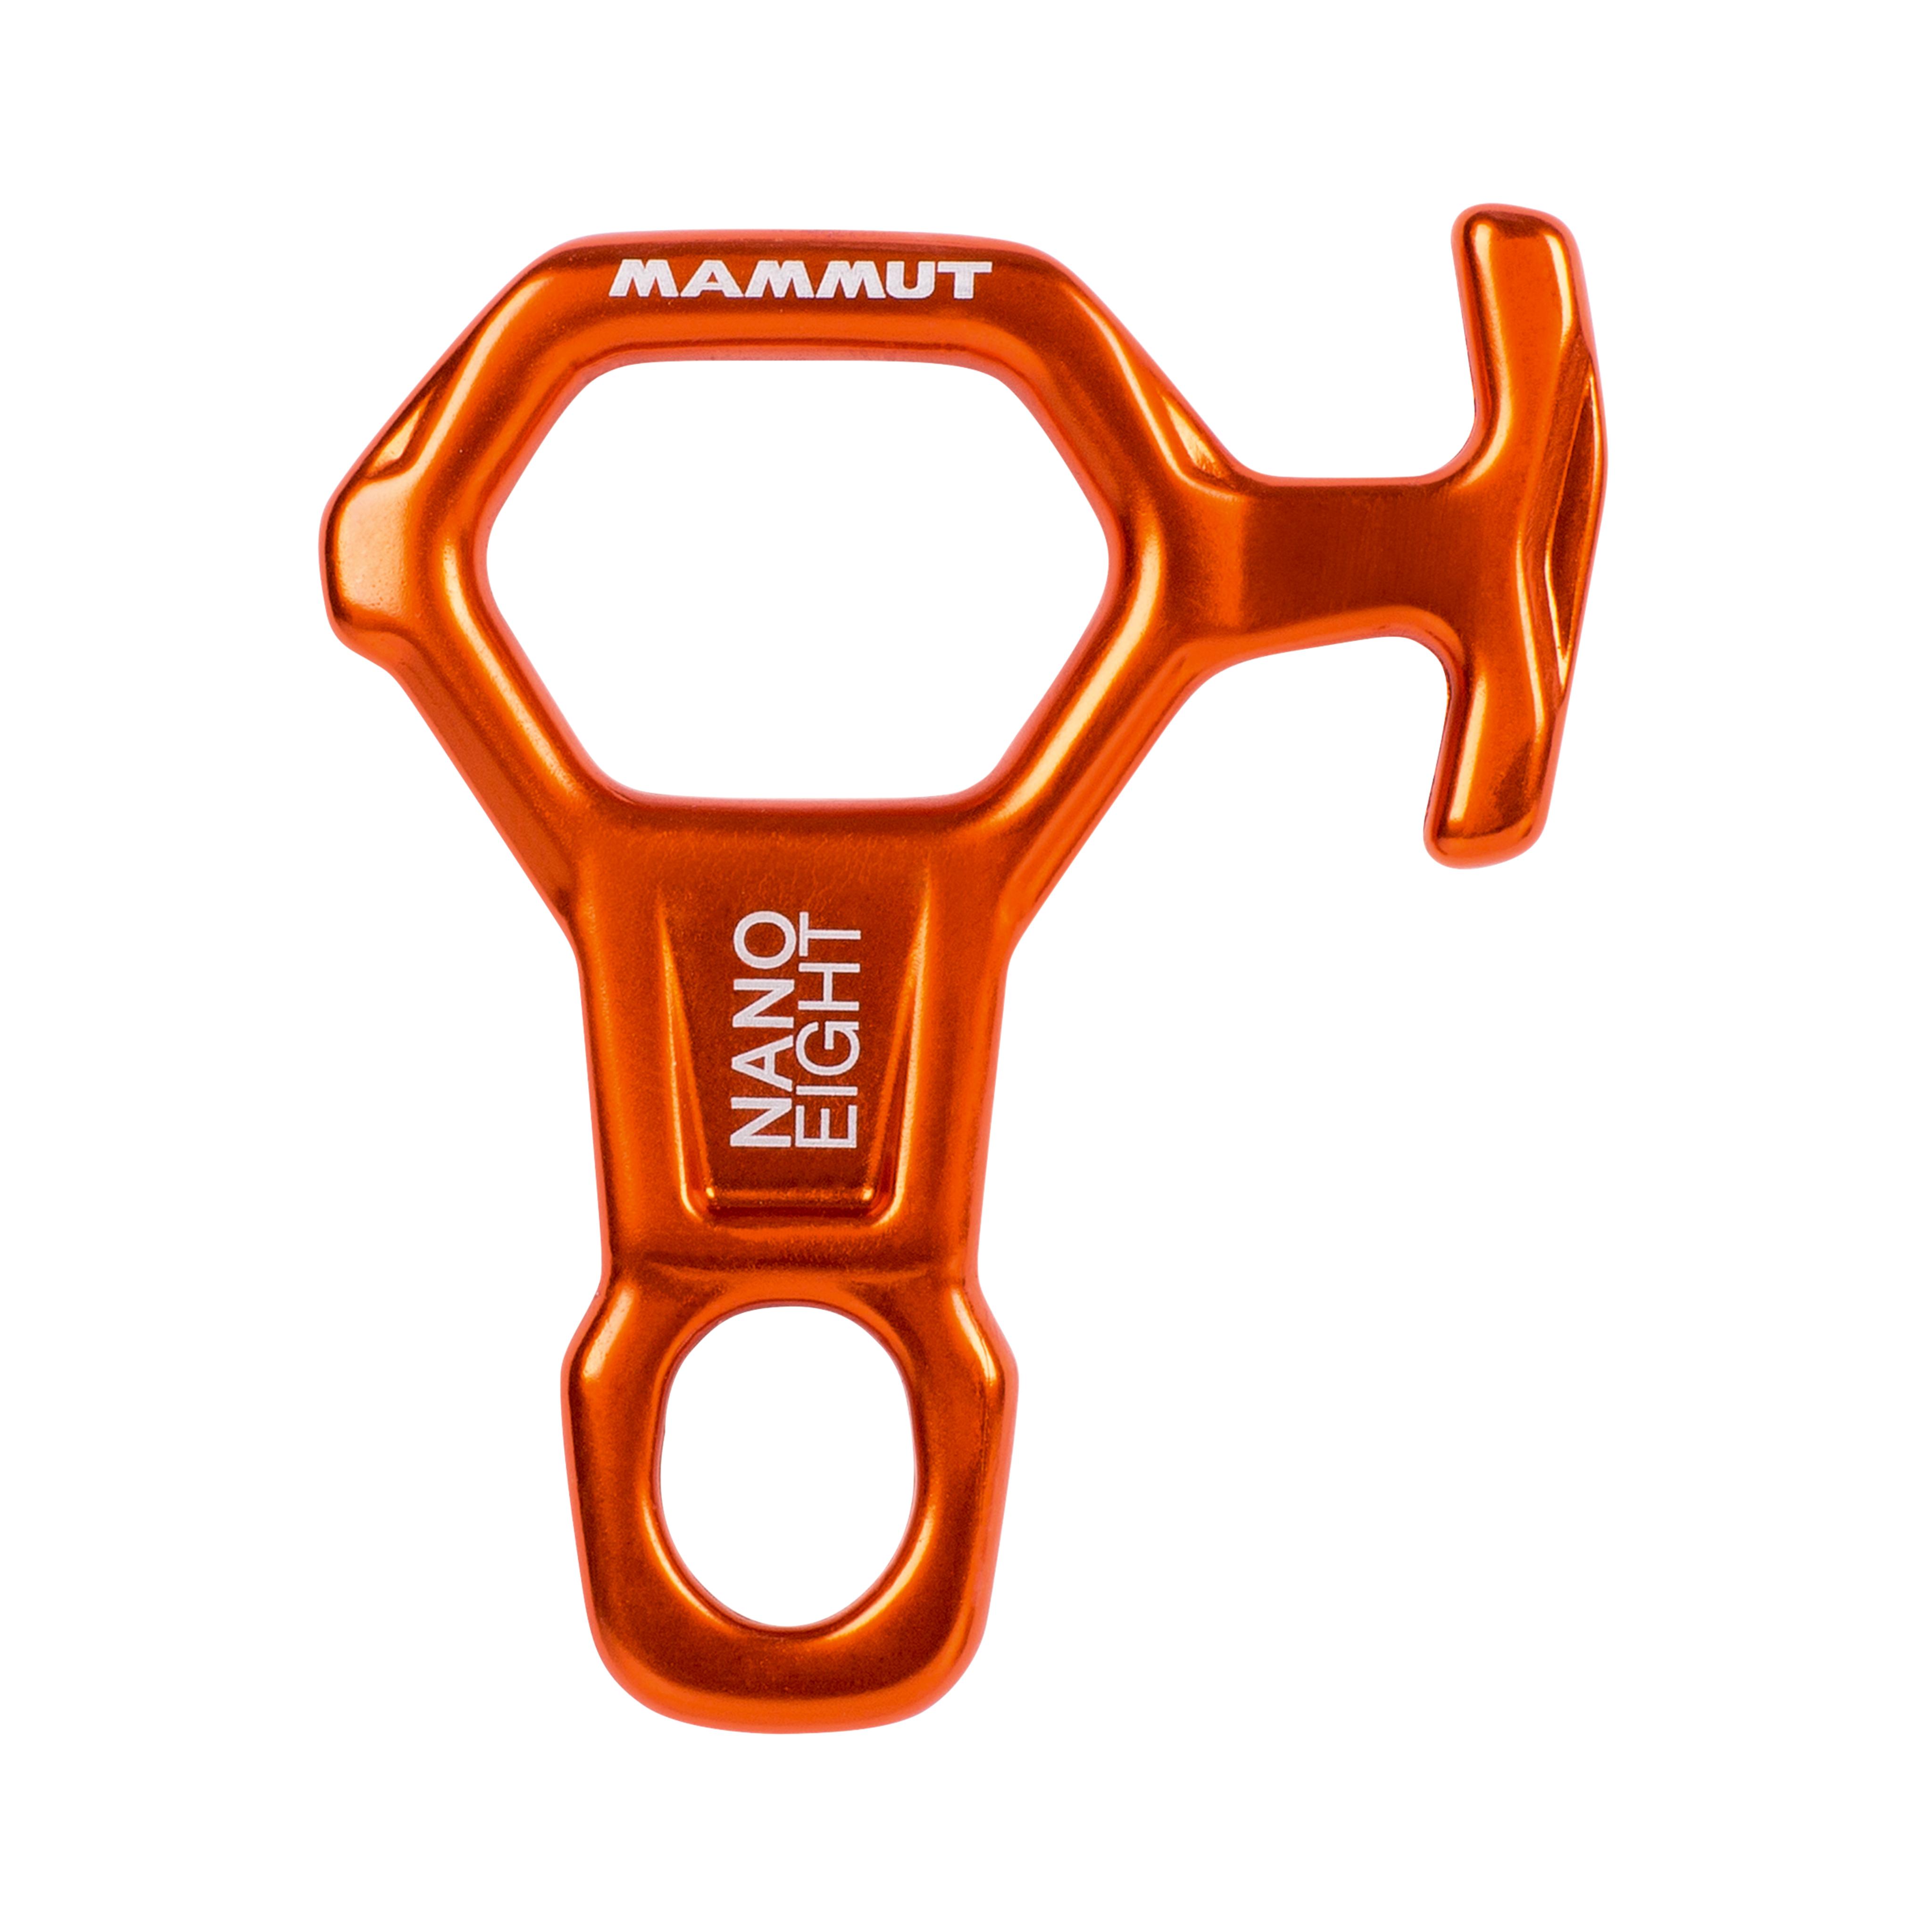 Nano 8 product image